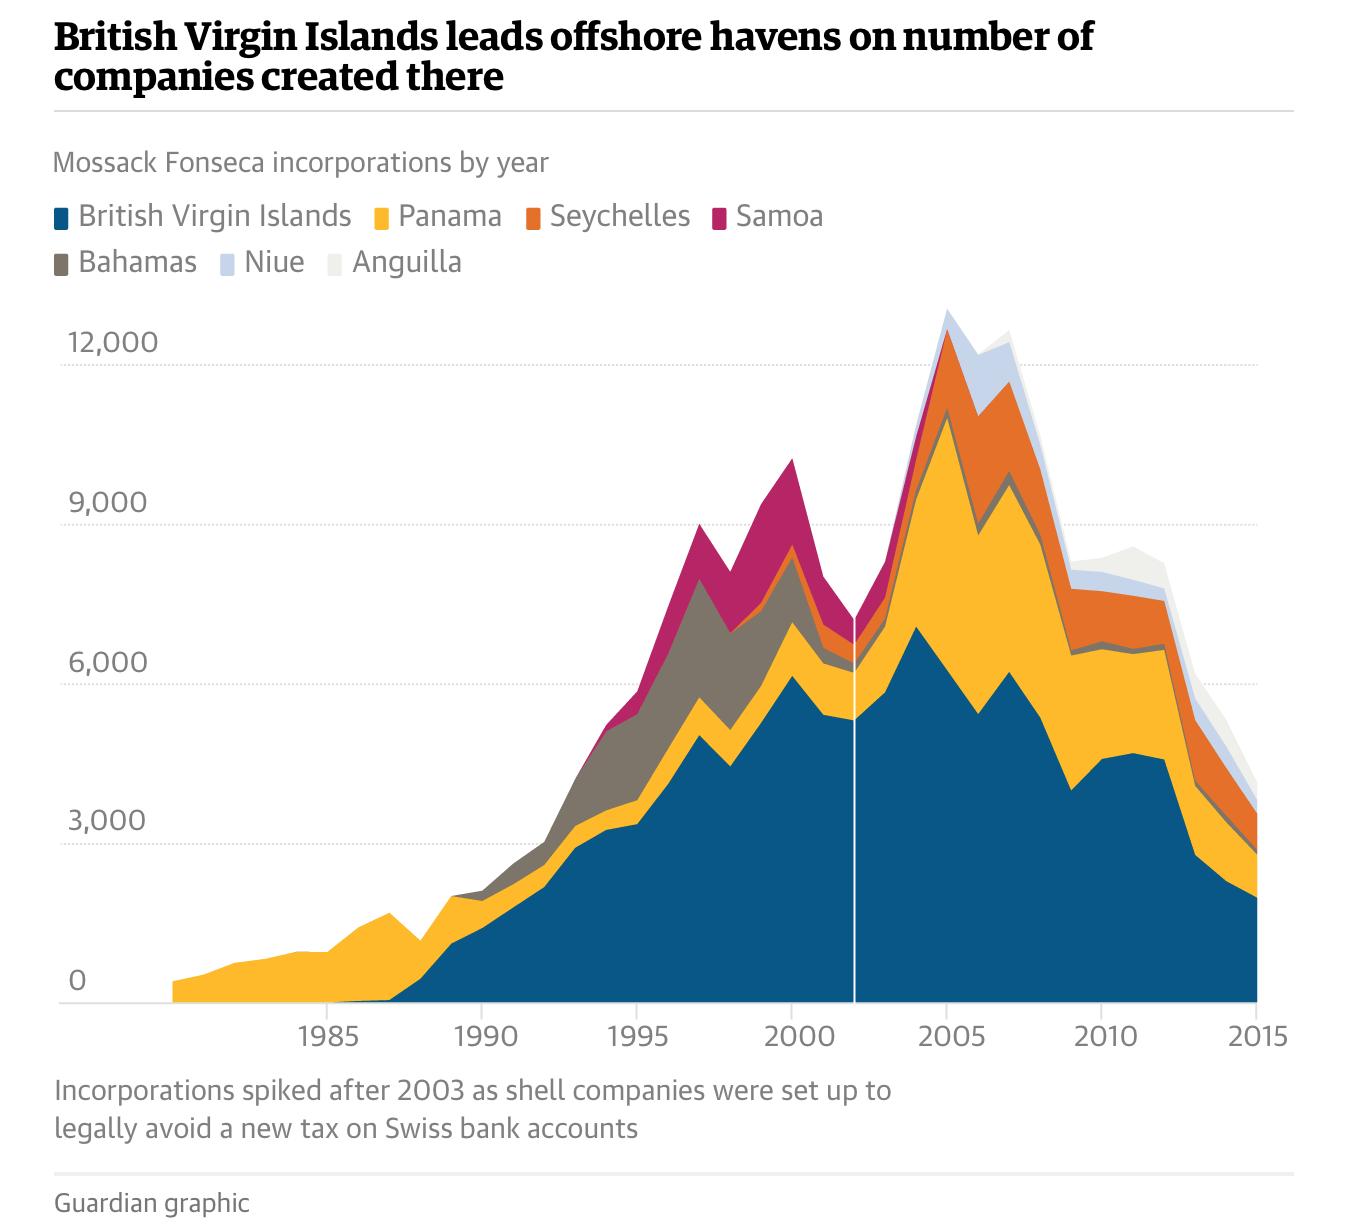 offshore havens bvi